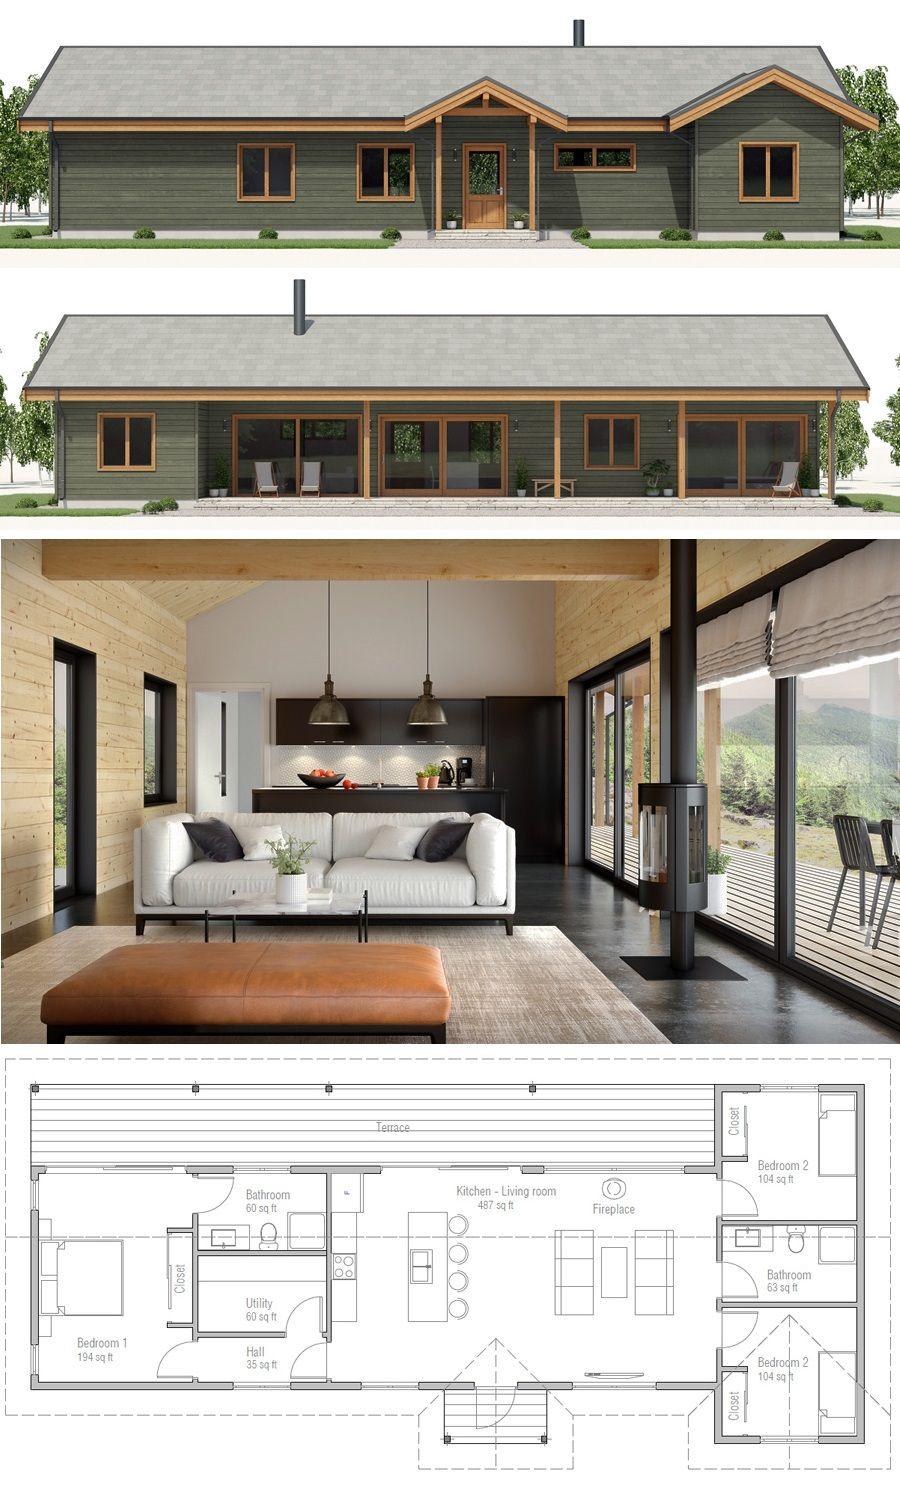 husplan litet hus huisplan husplan tiny house plans and layouts rh pinterest com